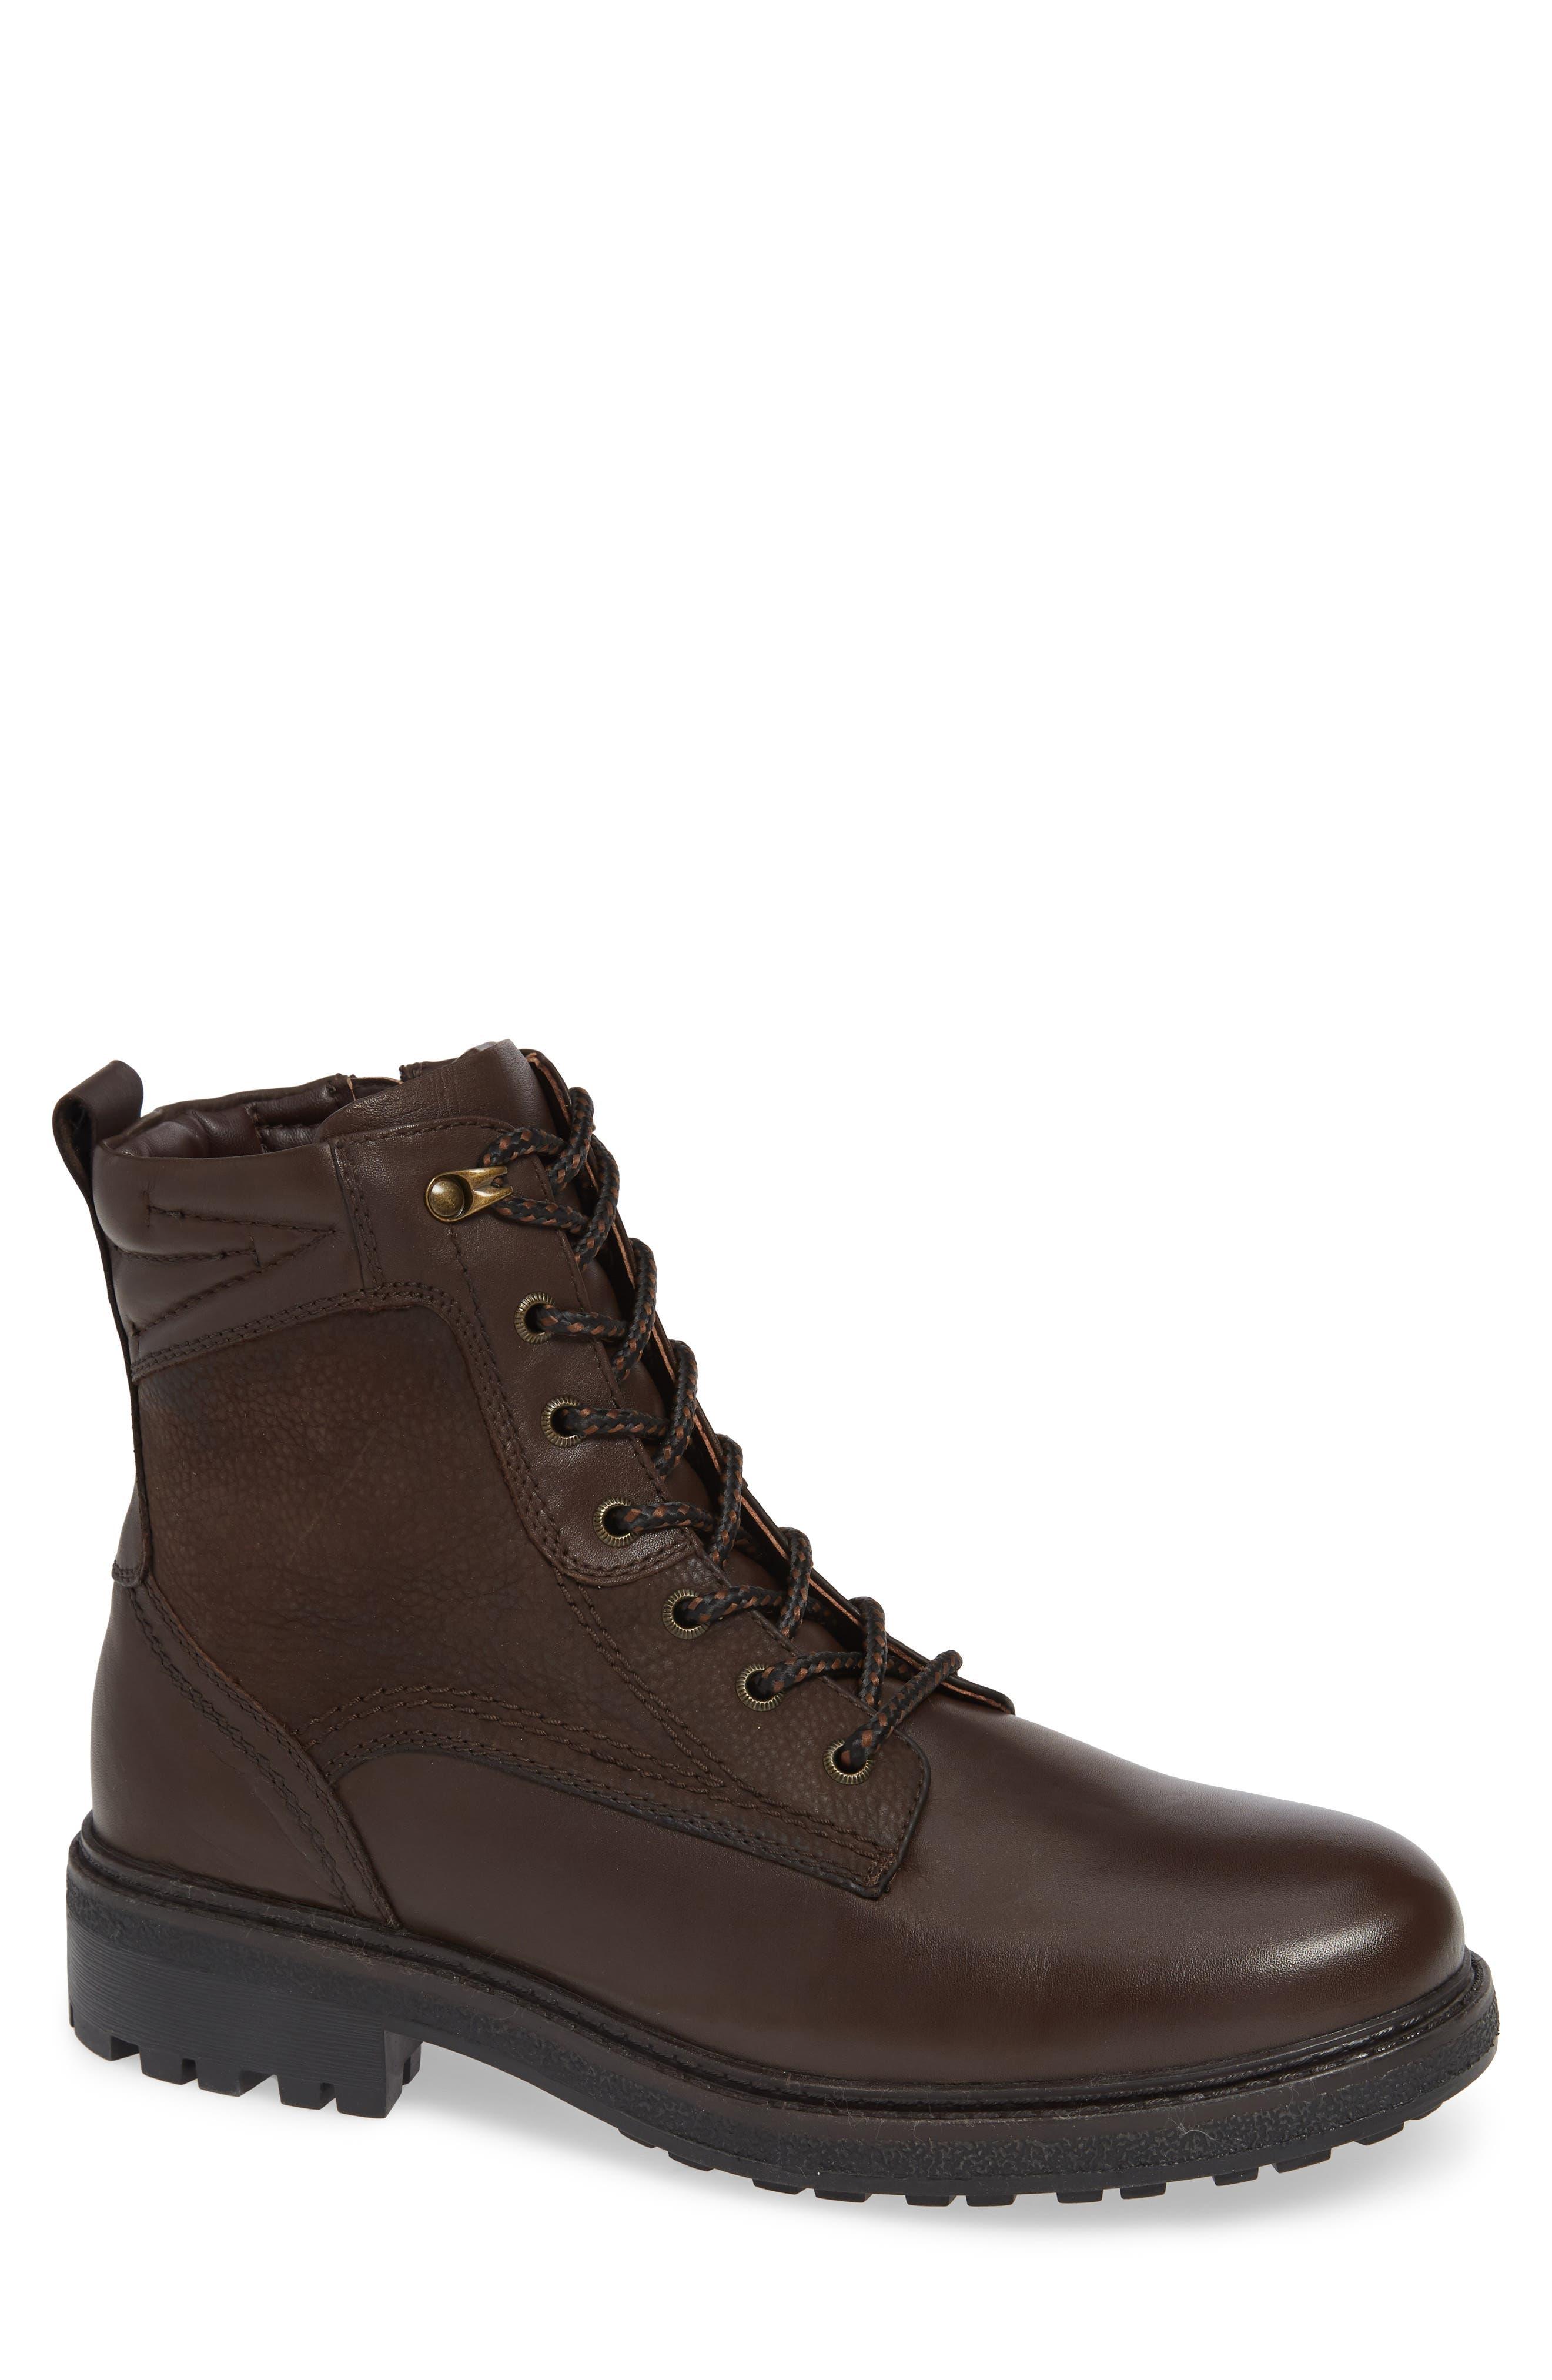 BLONDO, Jasper Waterproof Plain Toe Boot, Main thumbnail 1, color, BROWN LEATHER